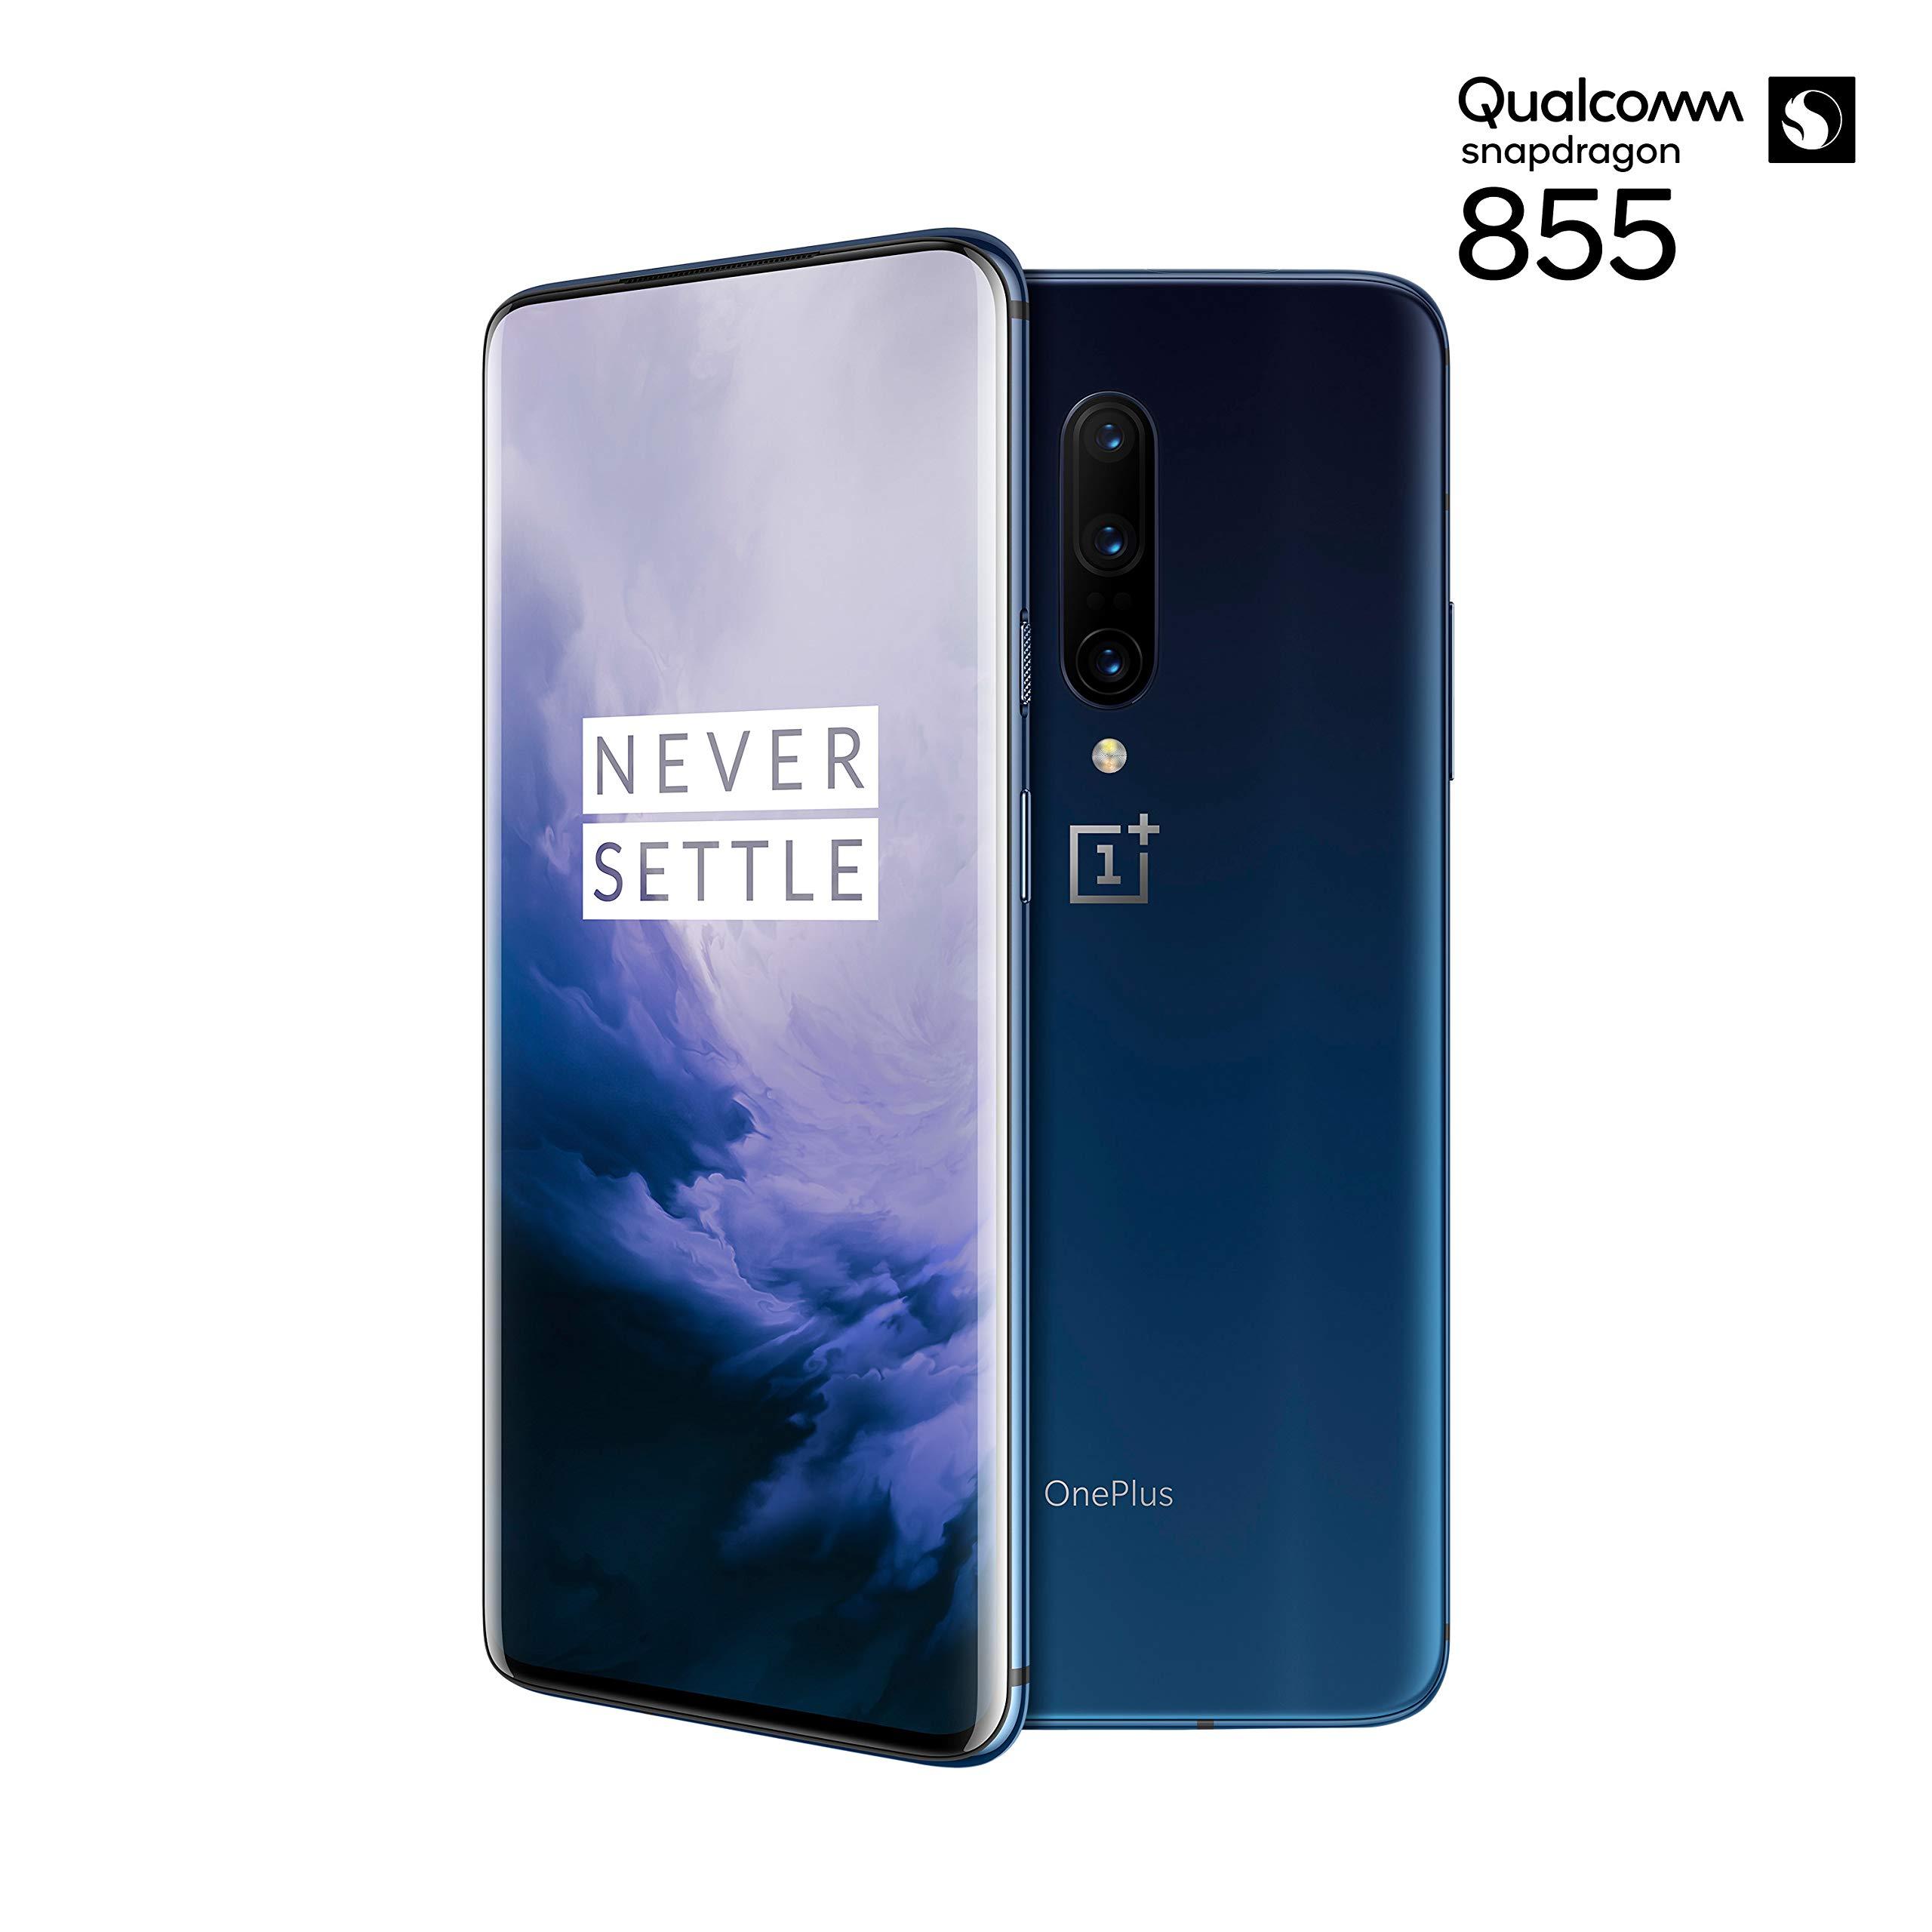 OnePlus 7 Pro Nebula Blue 8GB+256GB EU GM1913, Otra versión ...